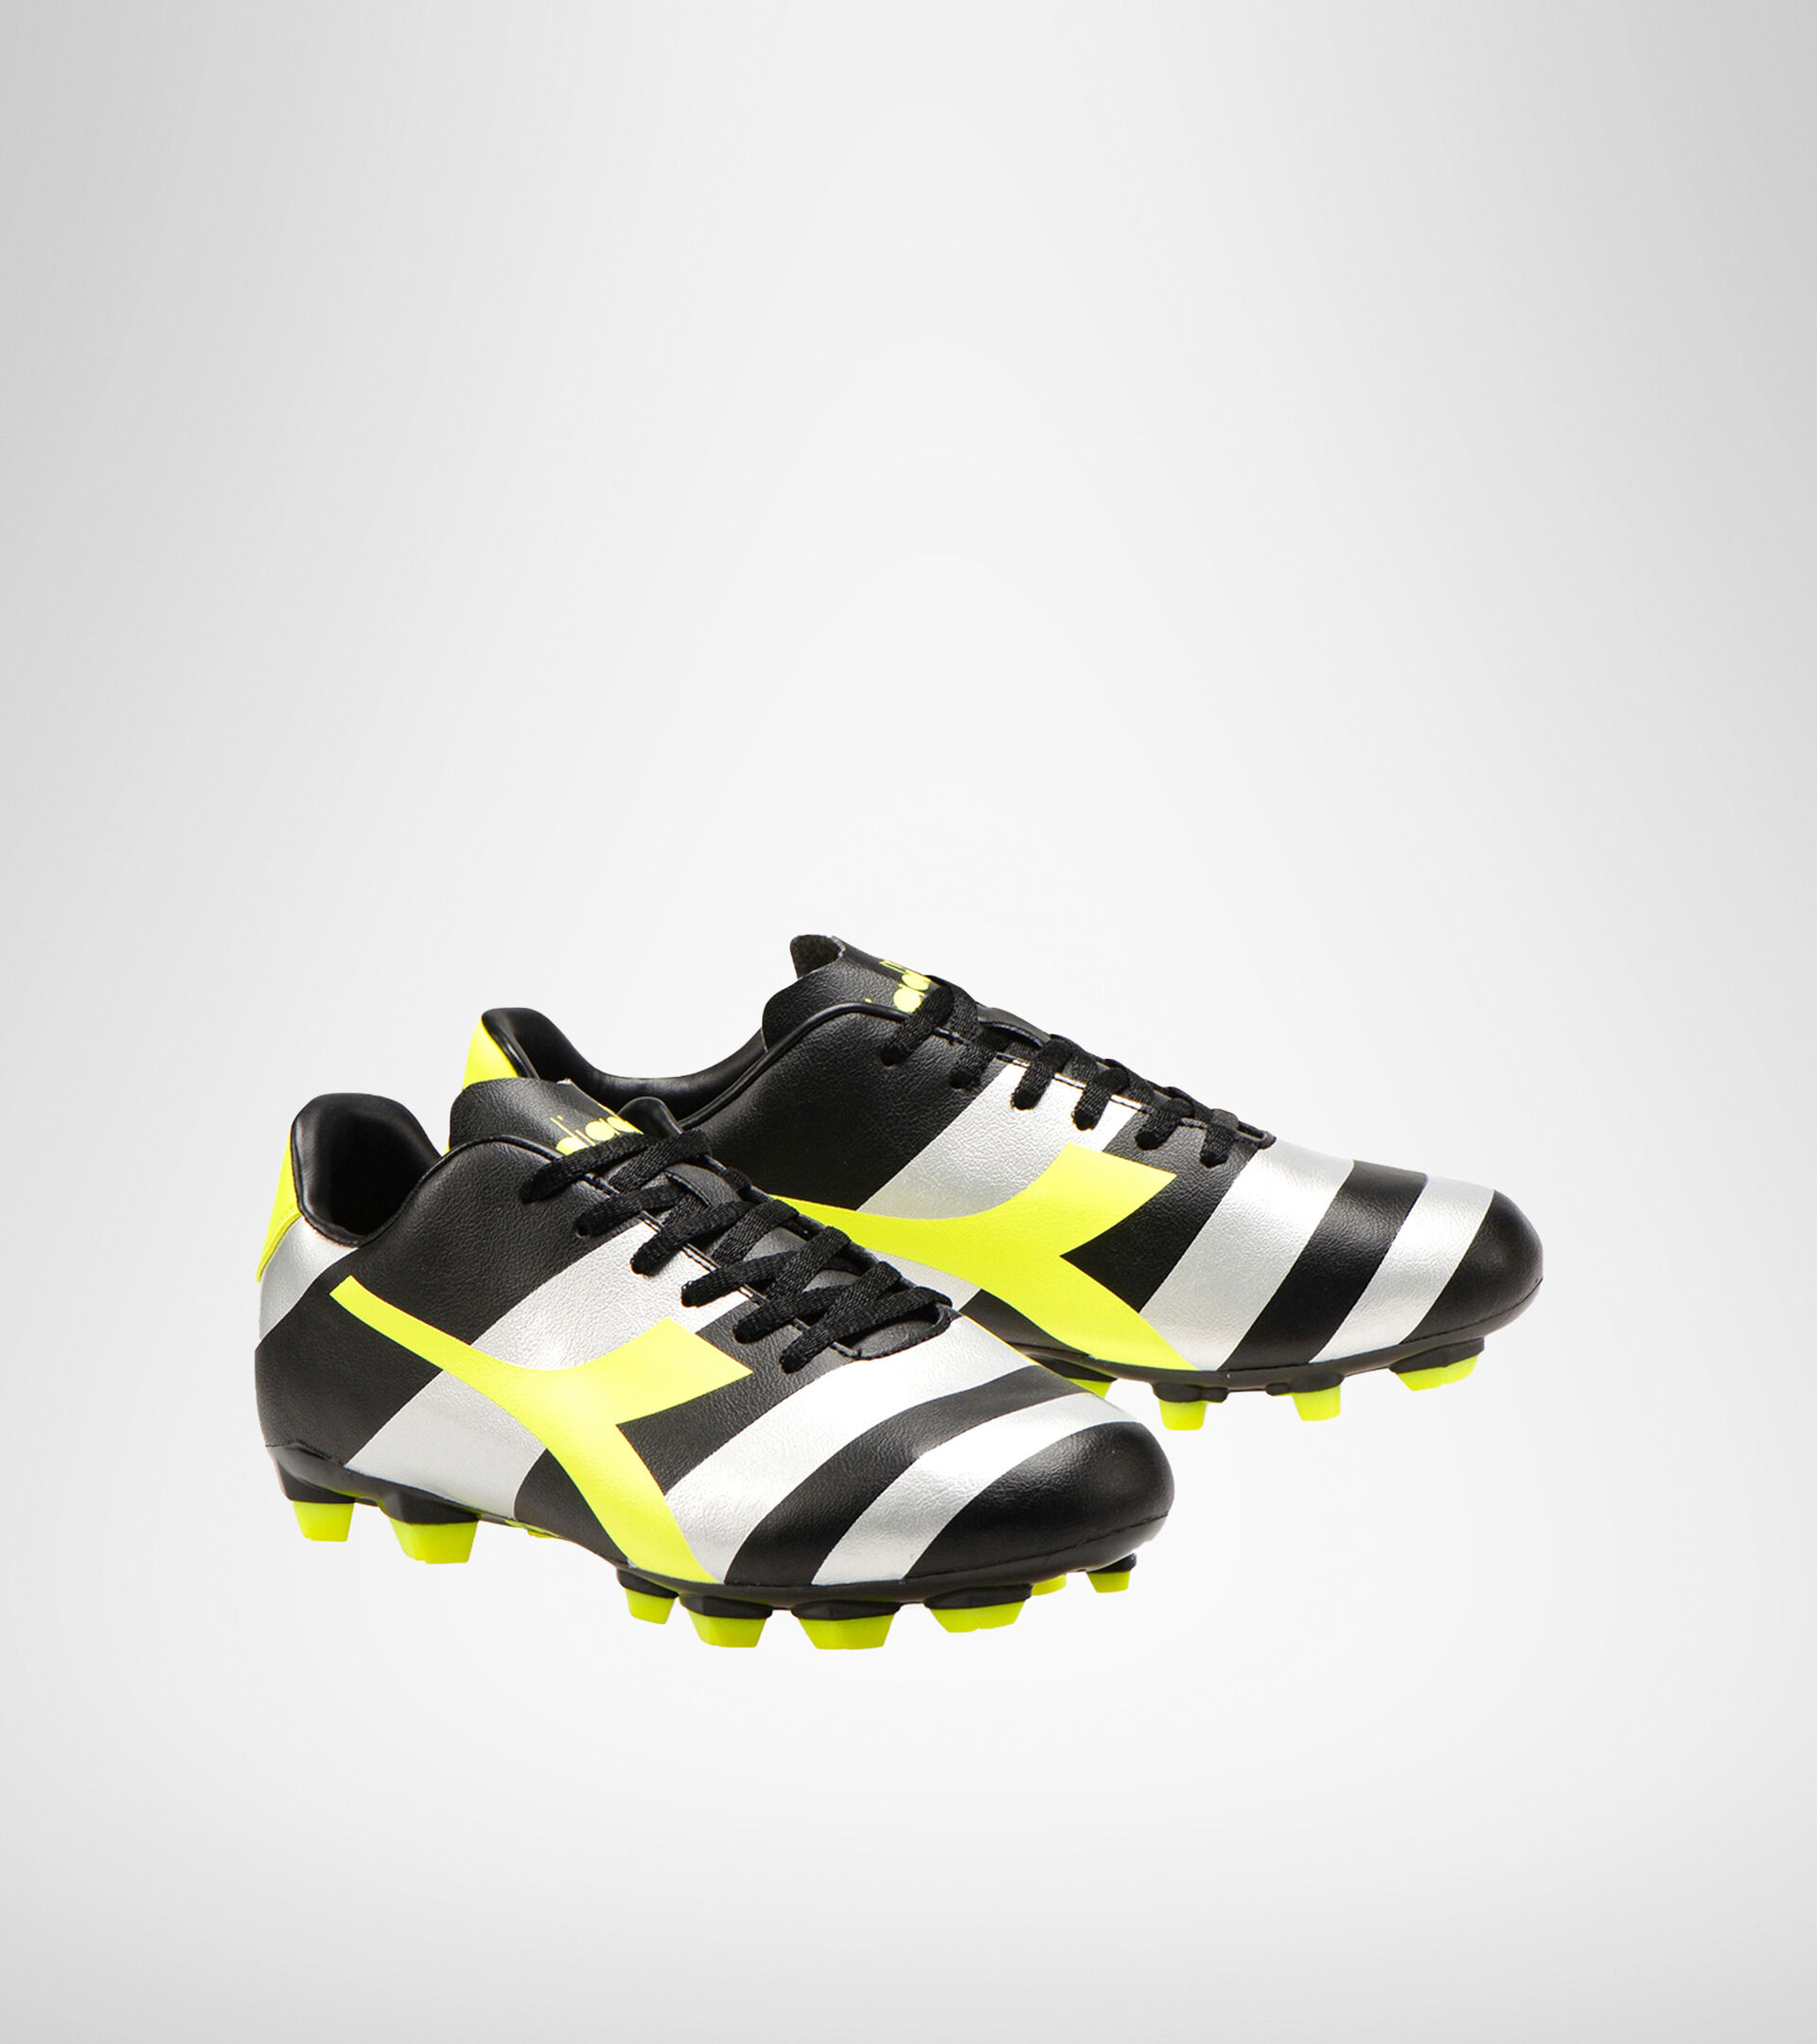 Chaussures de football pour terrains compacts RAPTOR R LPU NERO/ARGENTO/GIALLO FL DD - Diadora